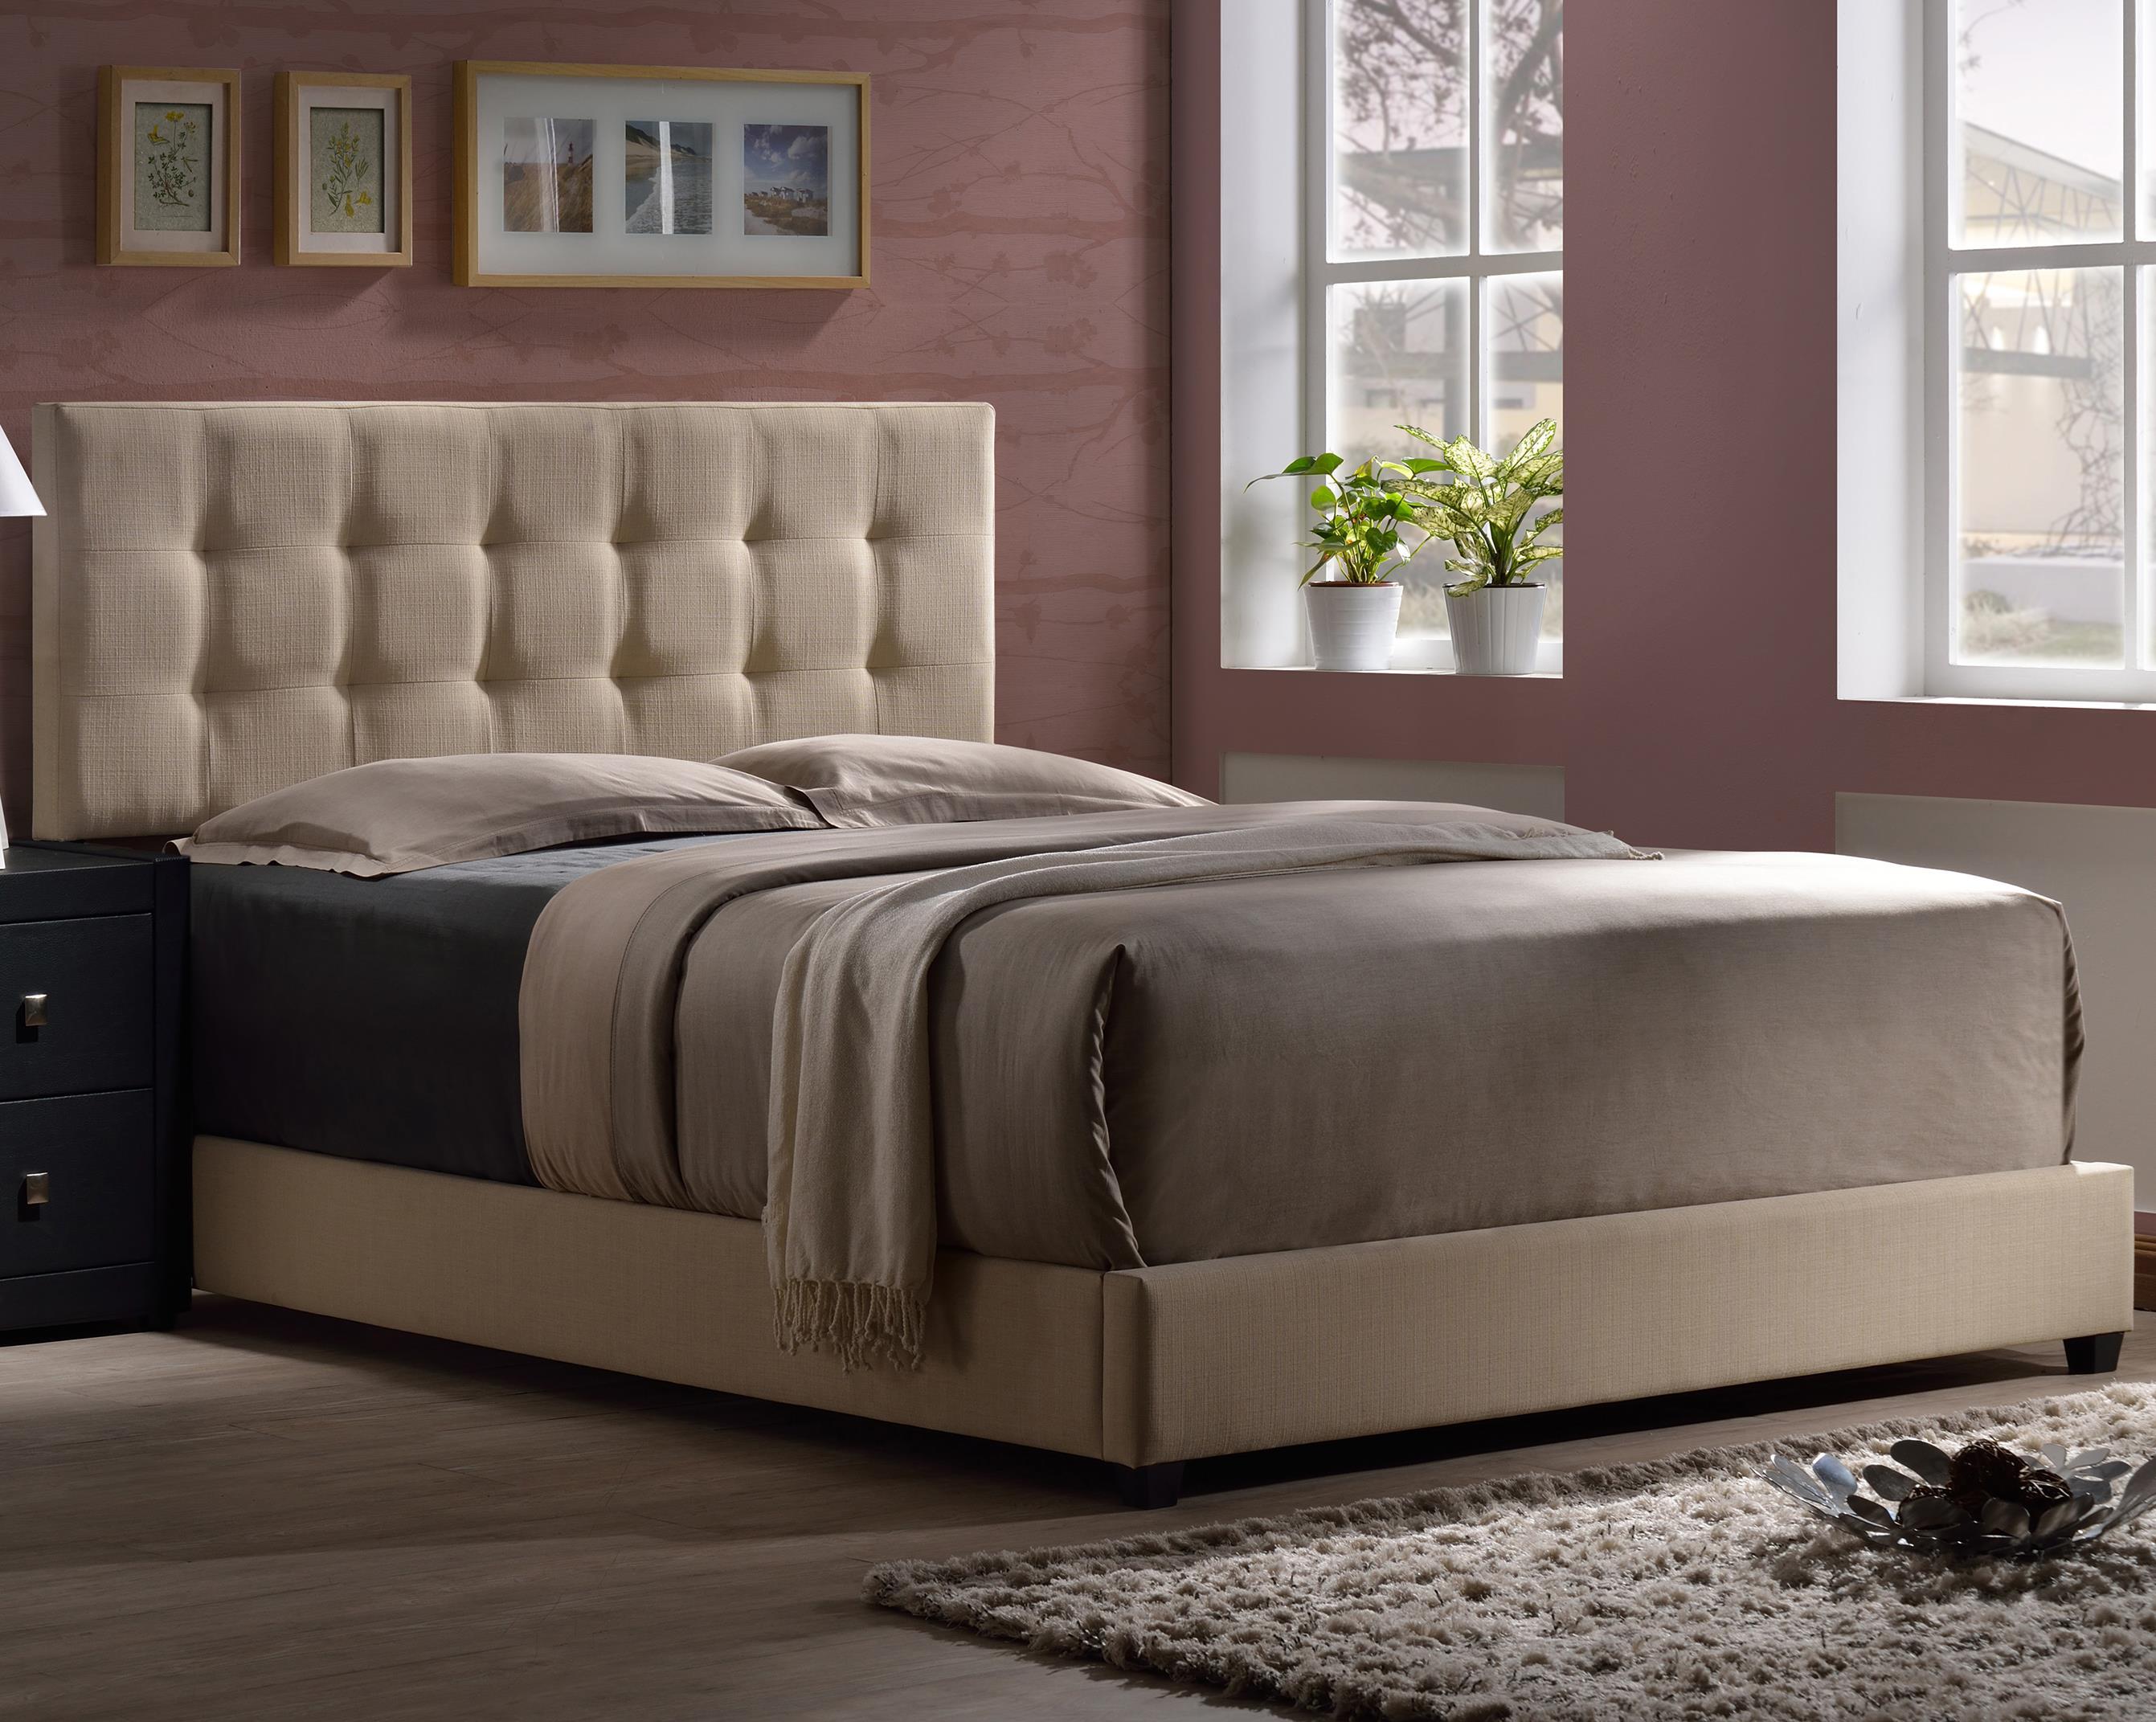 Hillsdale Duggan King Bed - Item Number: 1284BKR